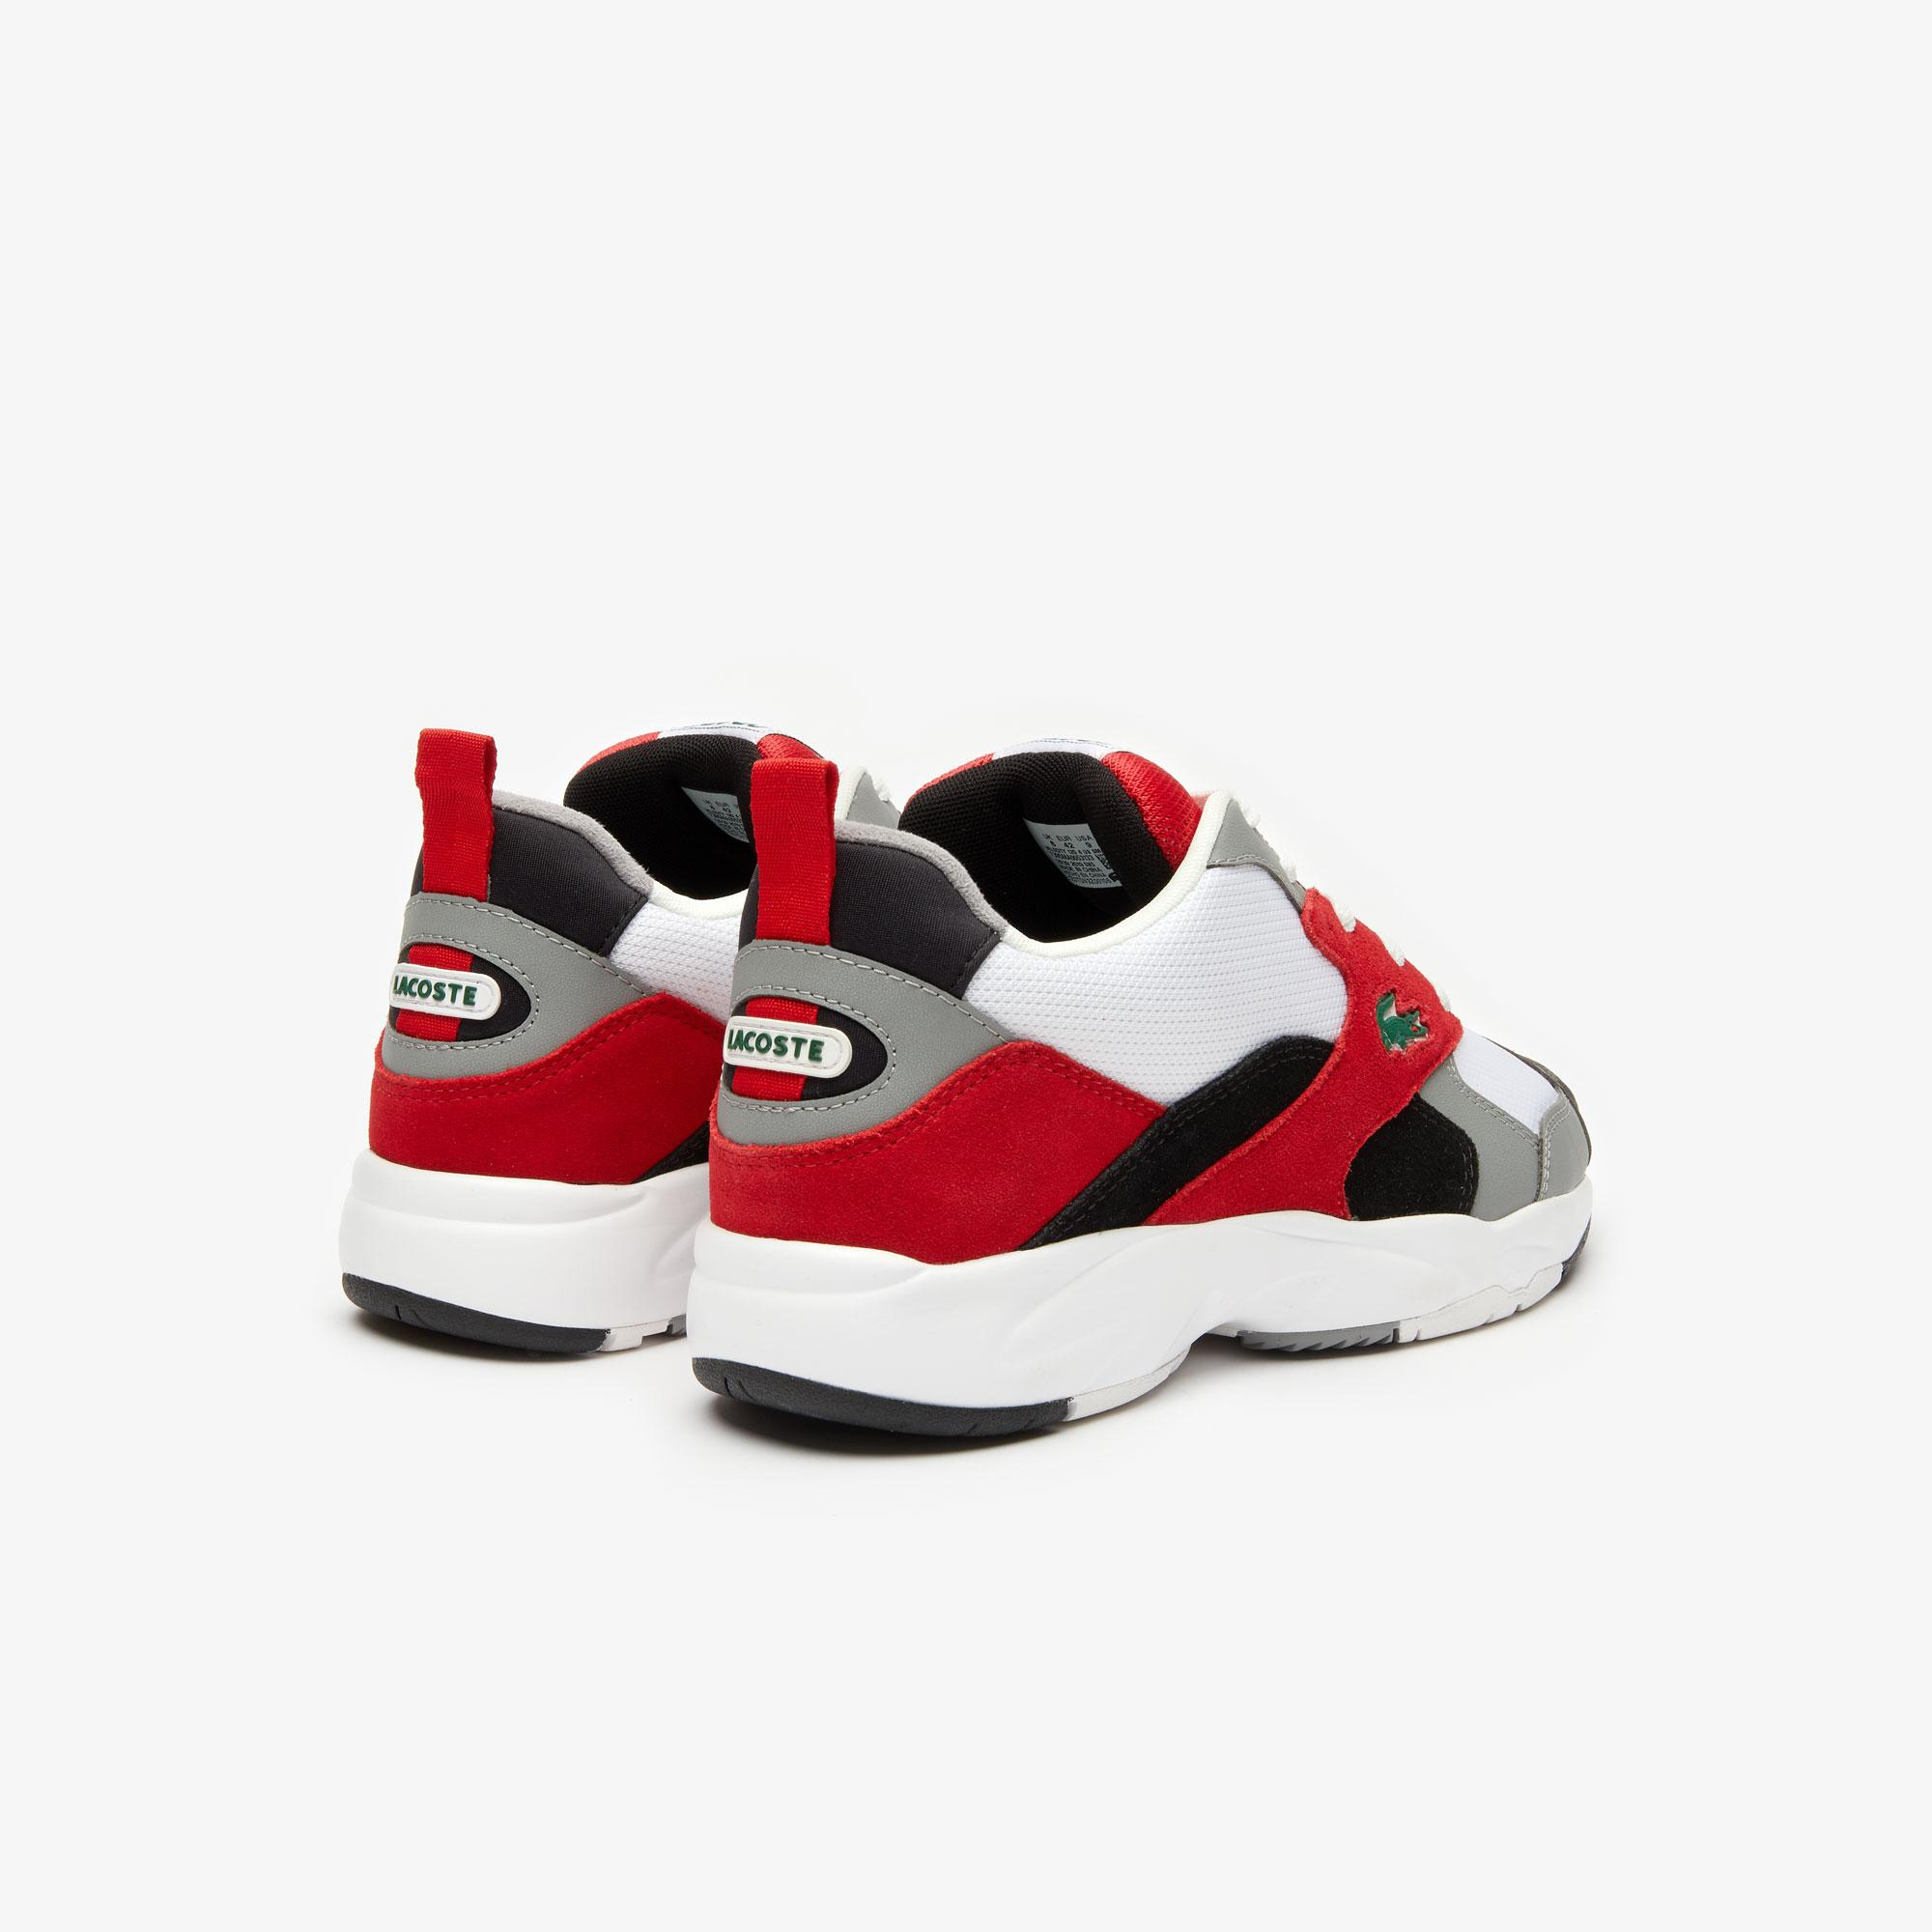 Lacoste Storm 96 120 4 Us Sma Erkek Gri - Kırmızı Sneaker